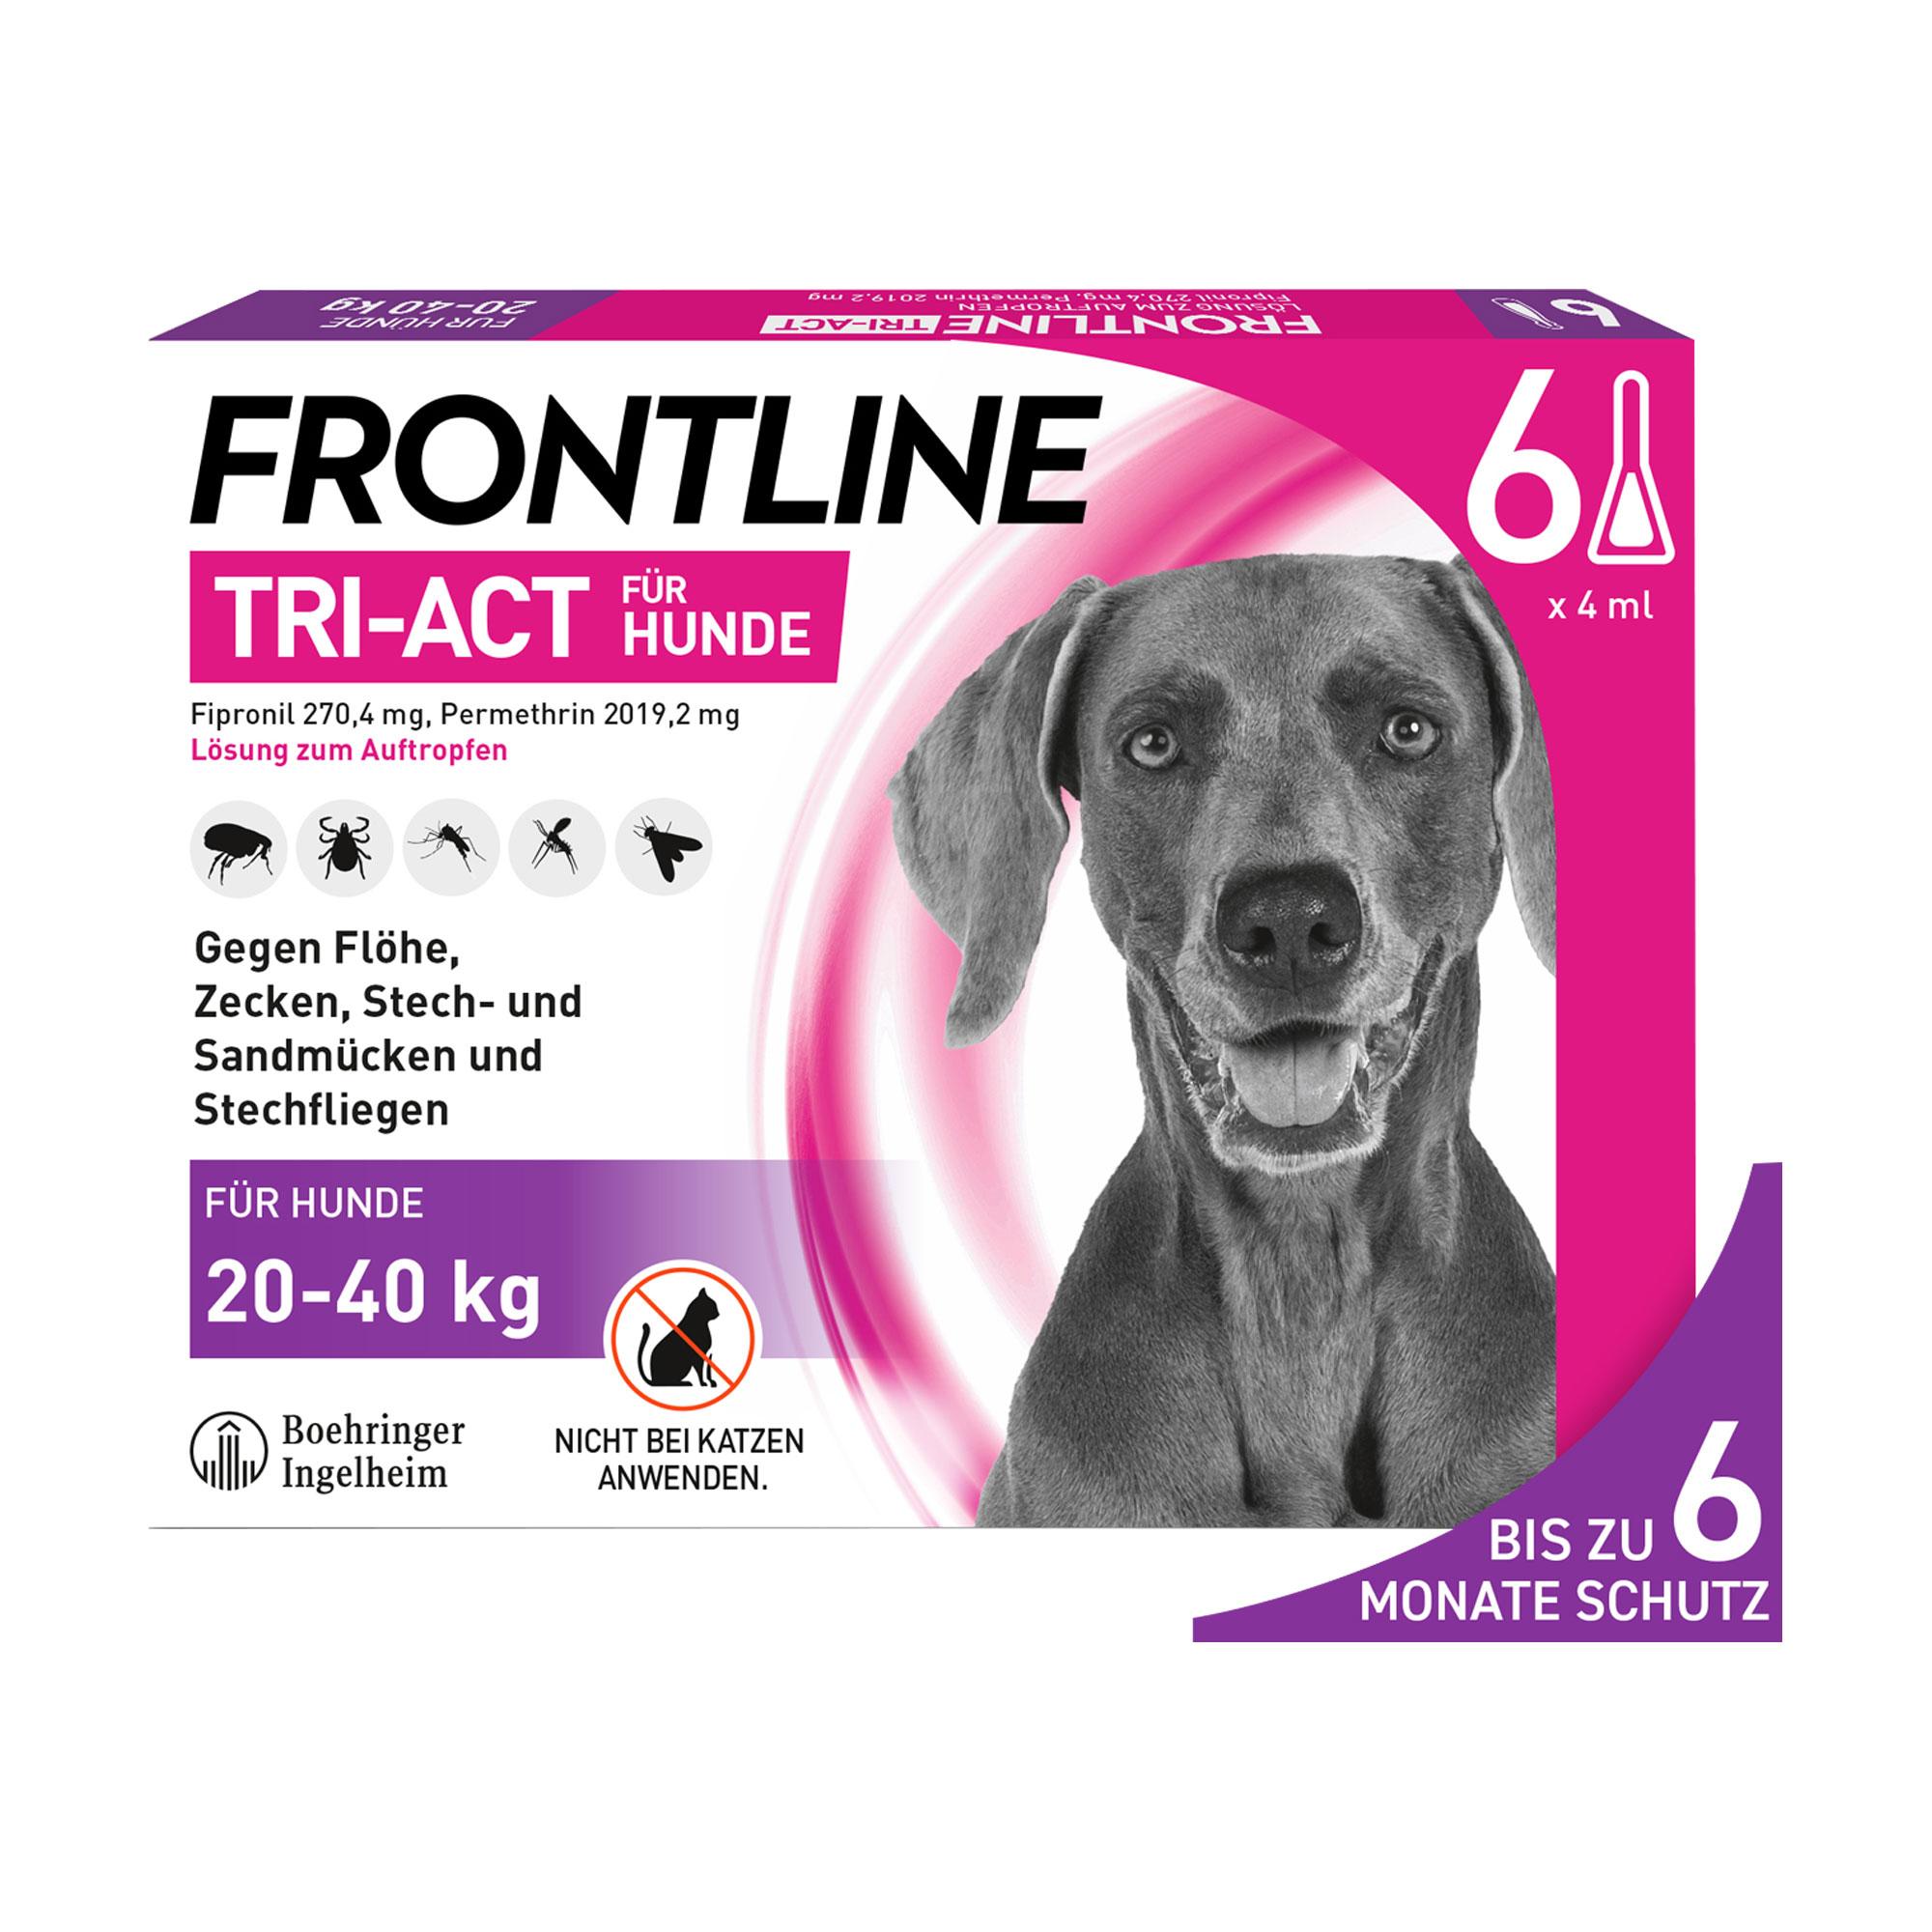 Frontline Tri-Act Hunde 20-40 kg